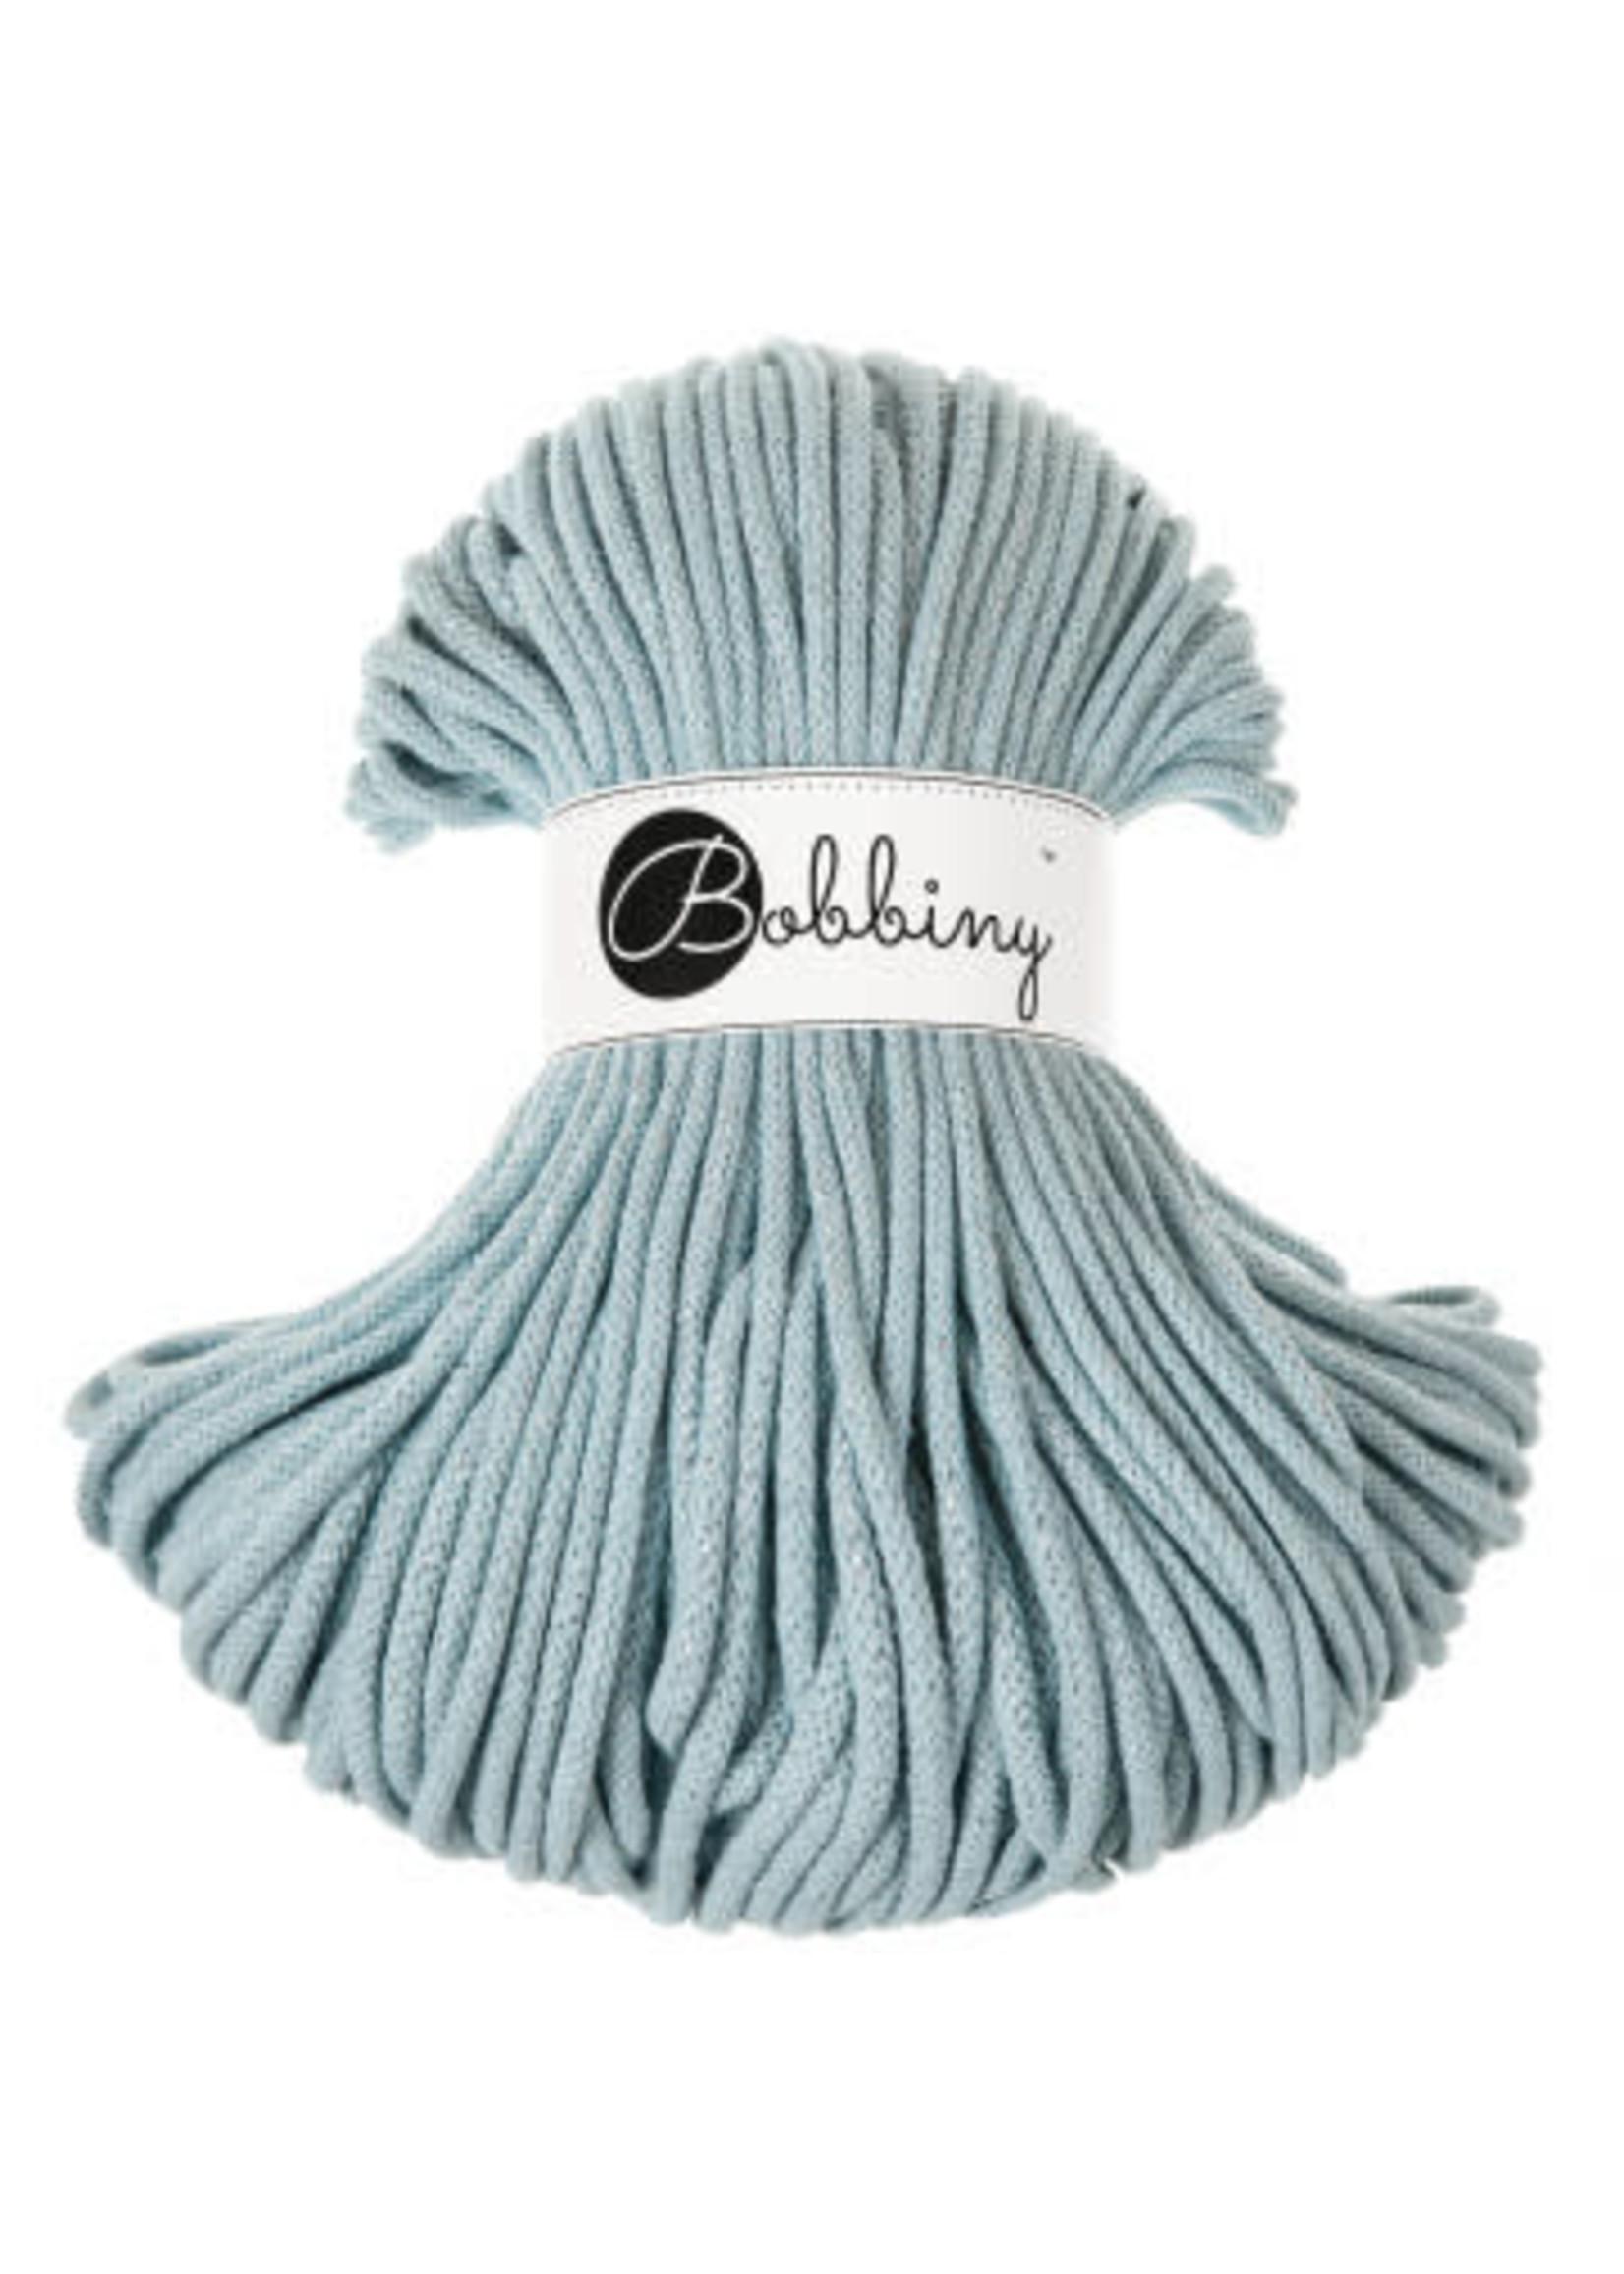 Bobbiny Bobbiny Premium - Misty Silver Glitter